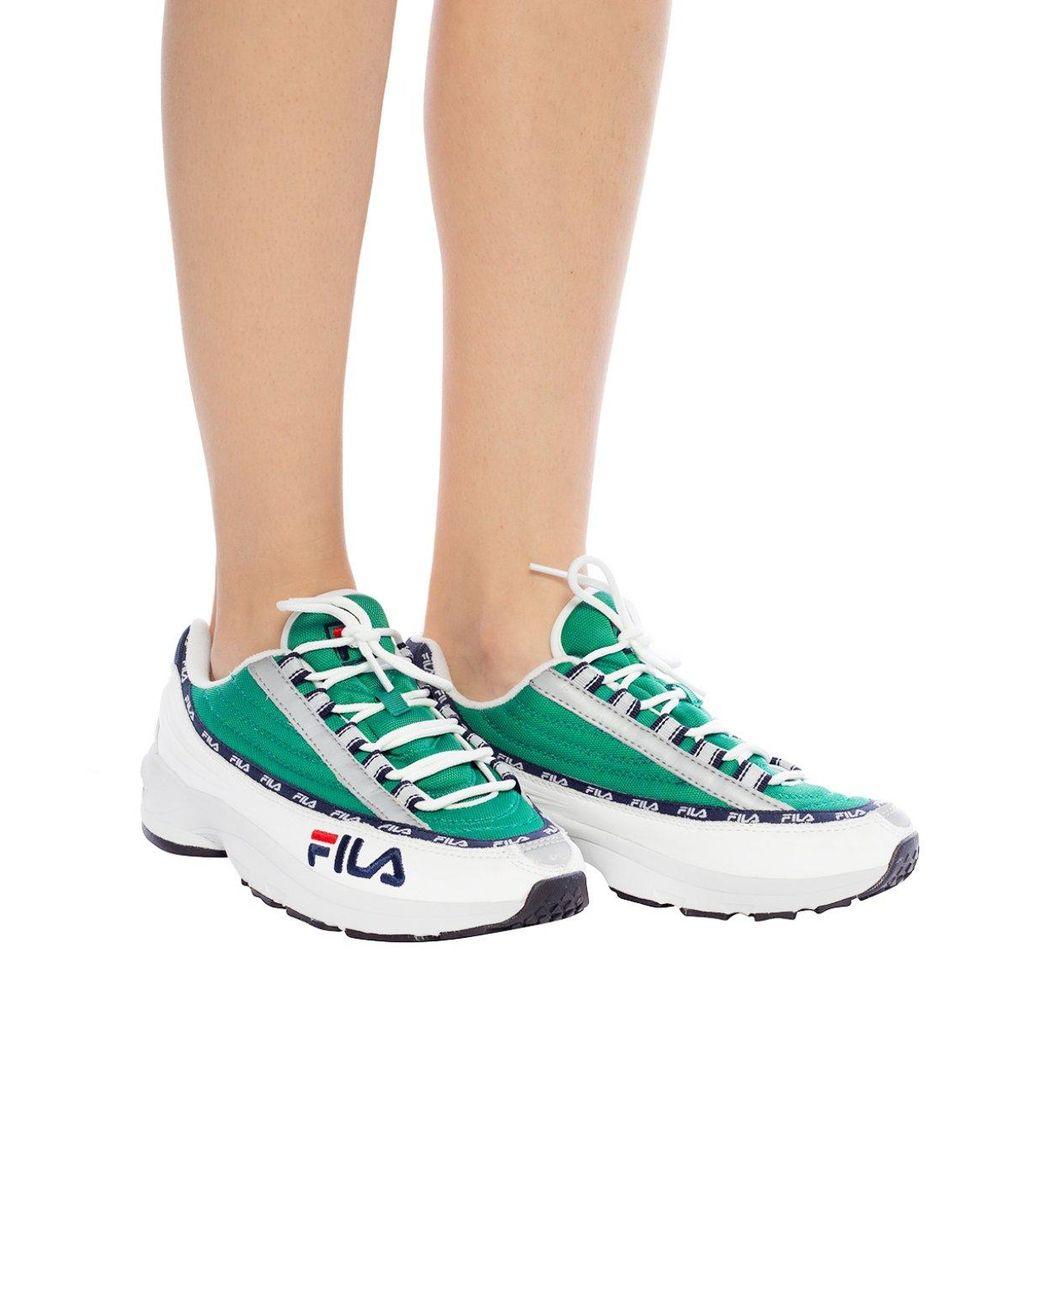 Fila Leather 'dstr97' Sneakers in Grey White Green (Green ...